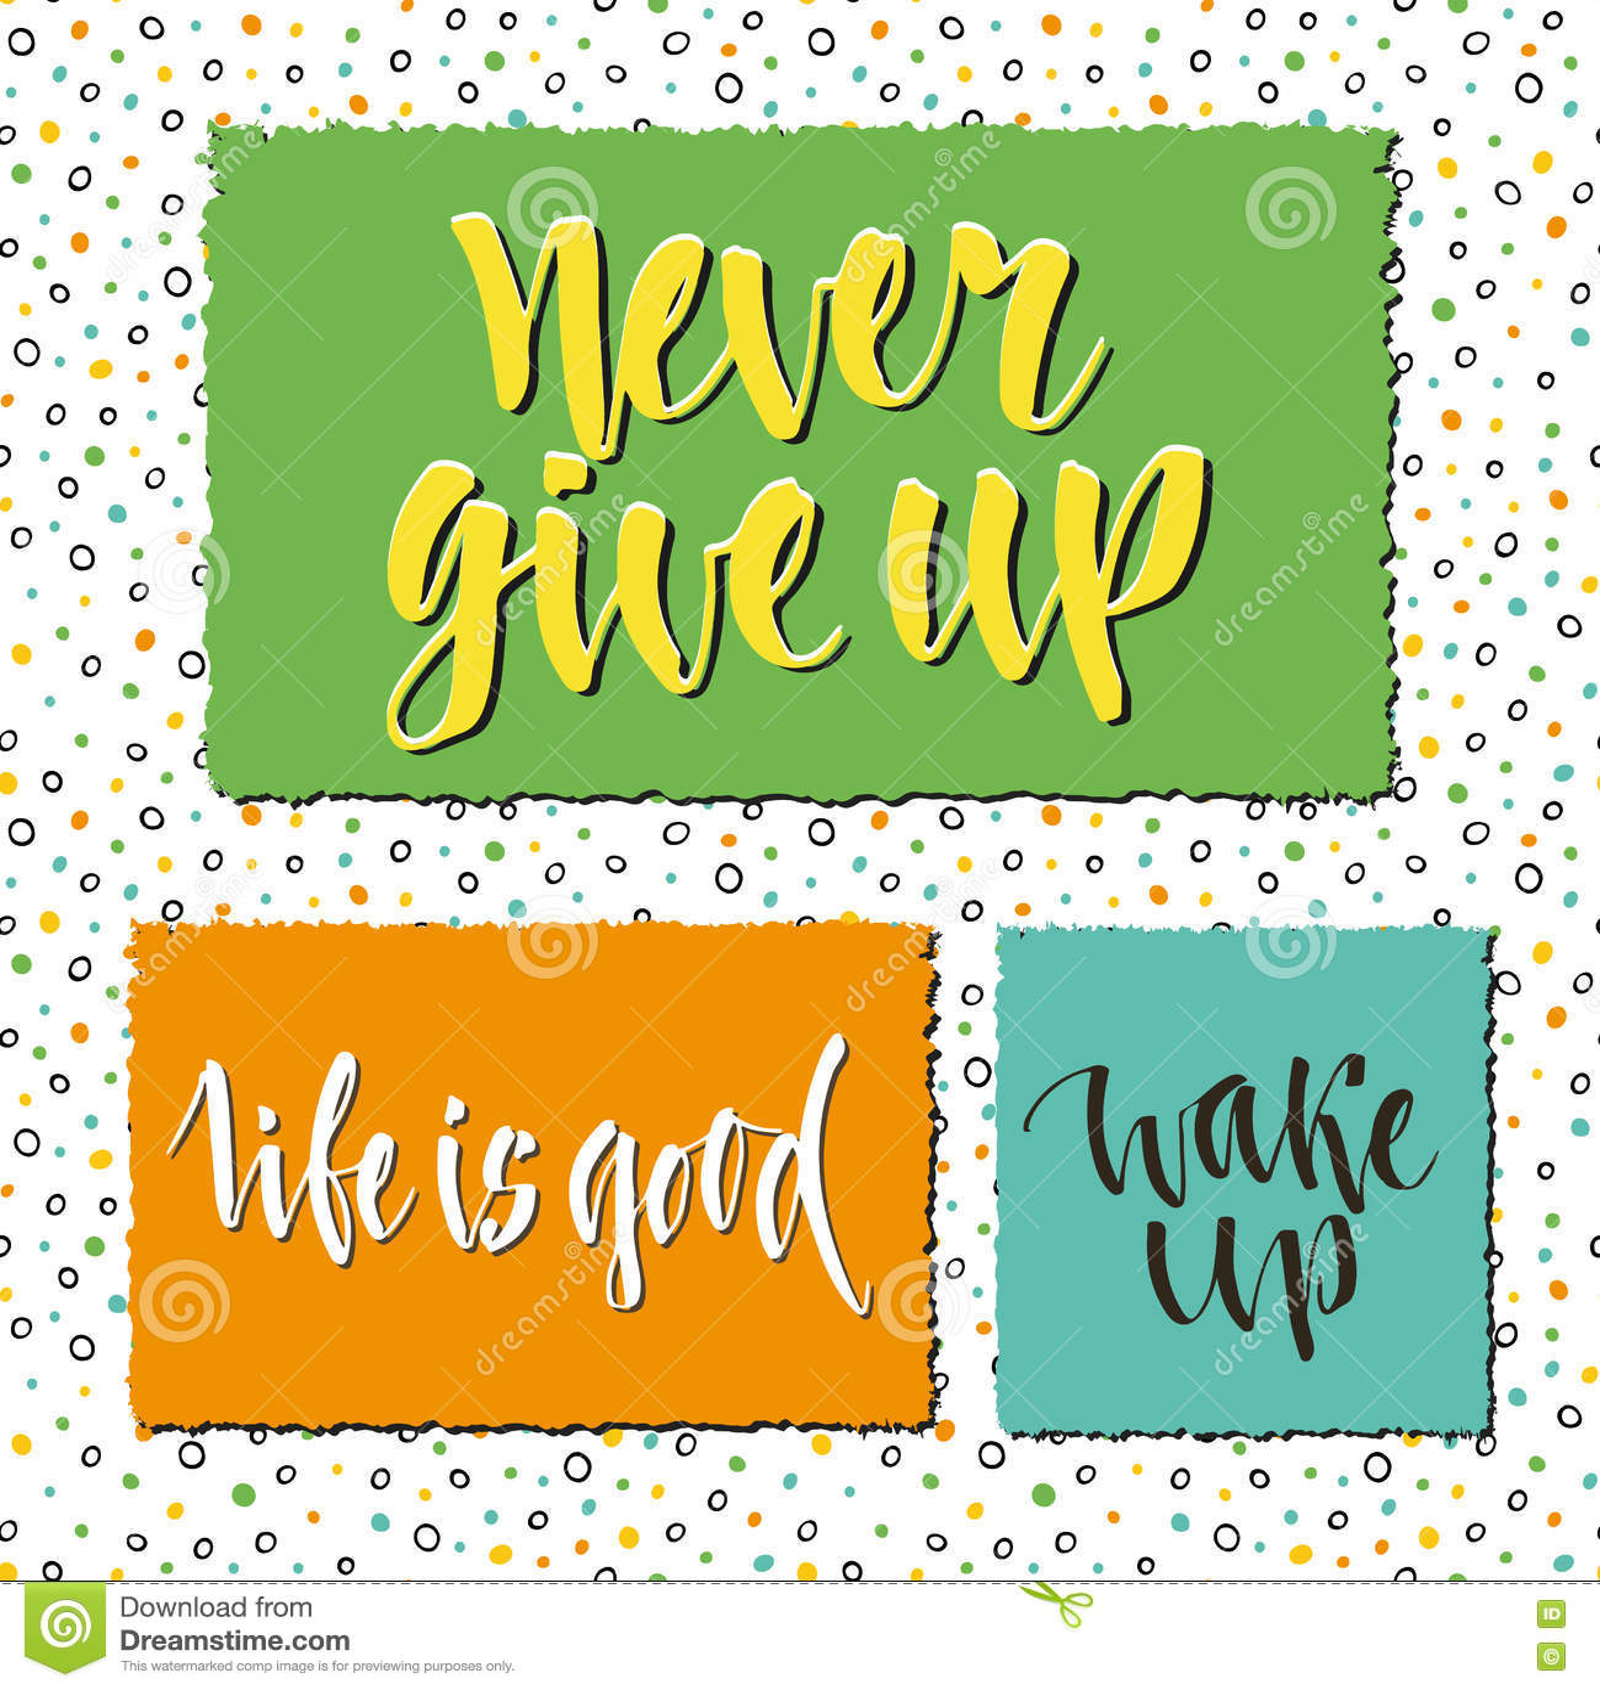 Motivational Phrases Lettering Set Of Postcards Stickers Or Bannersvector Design